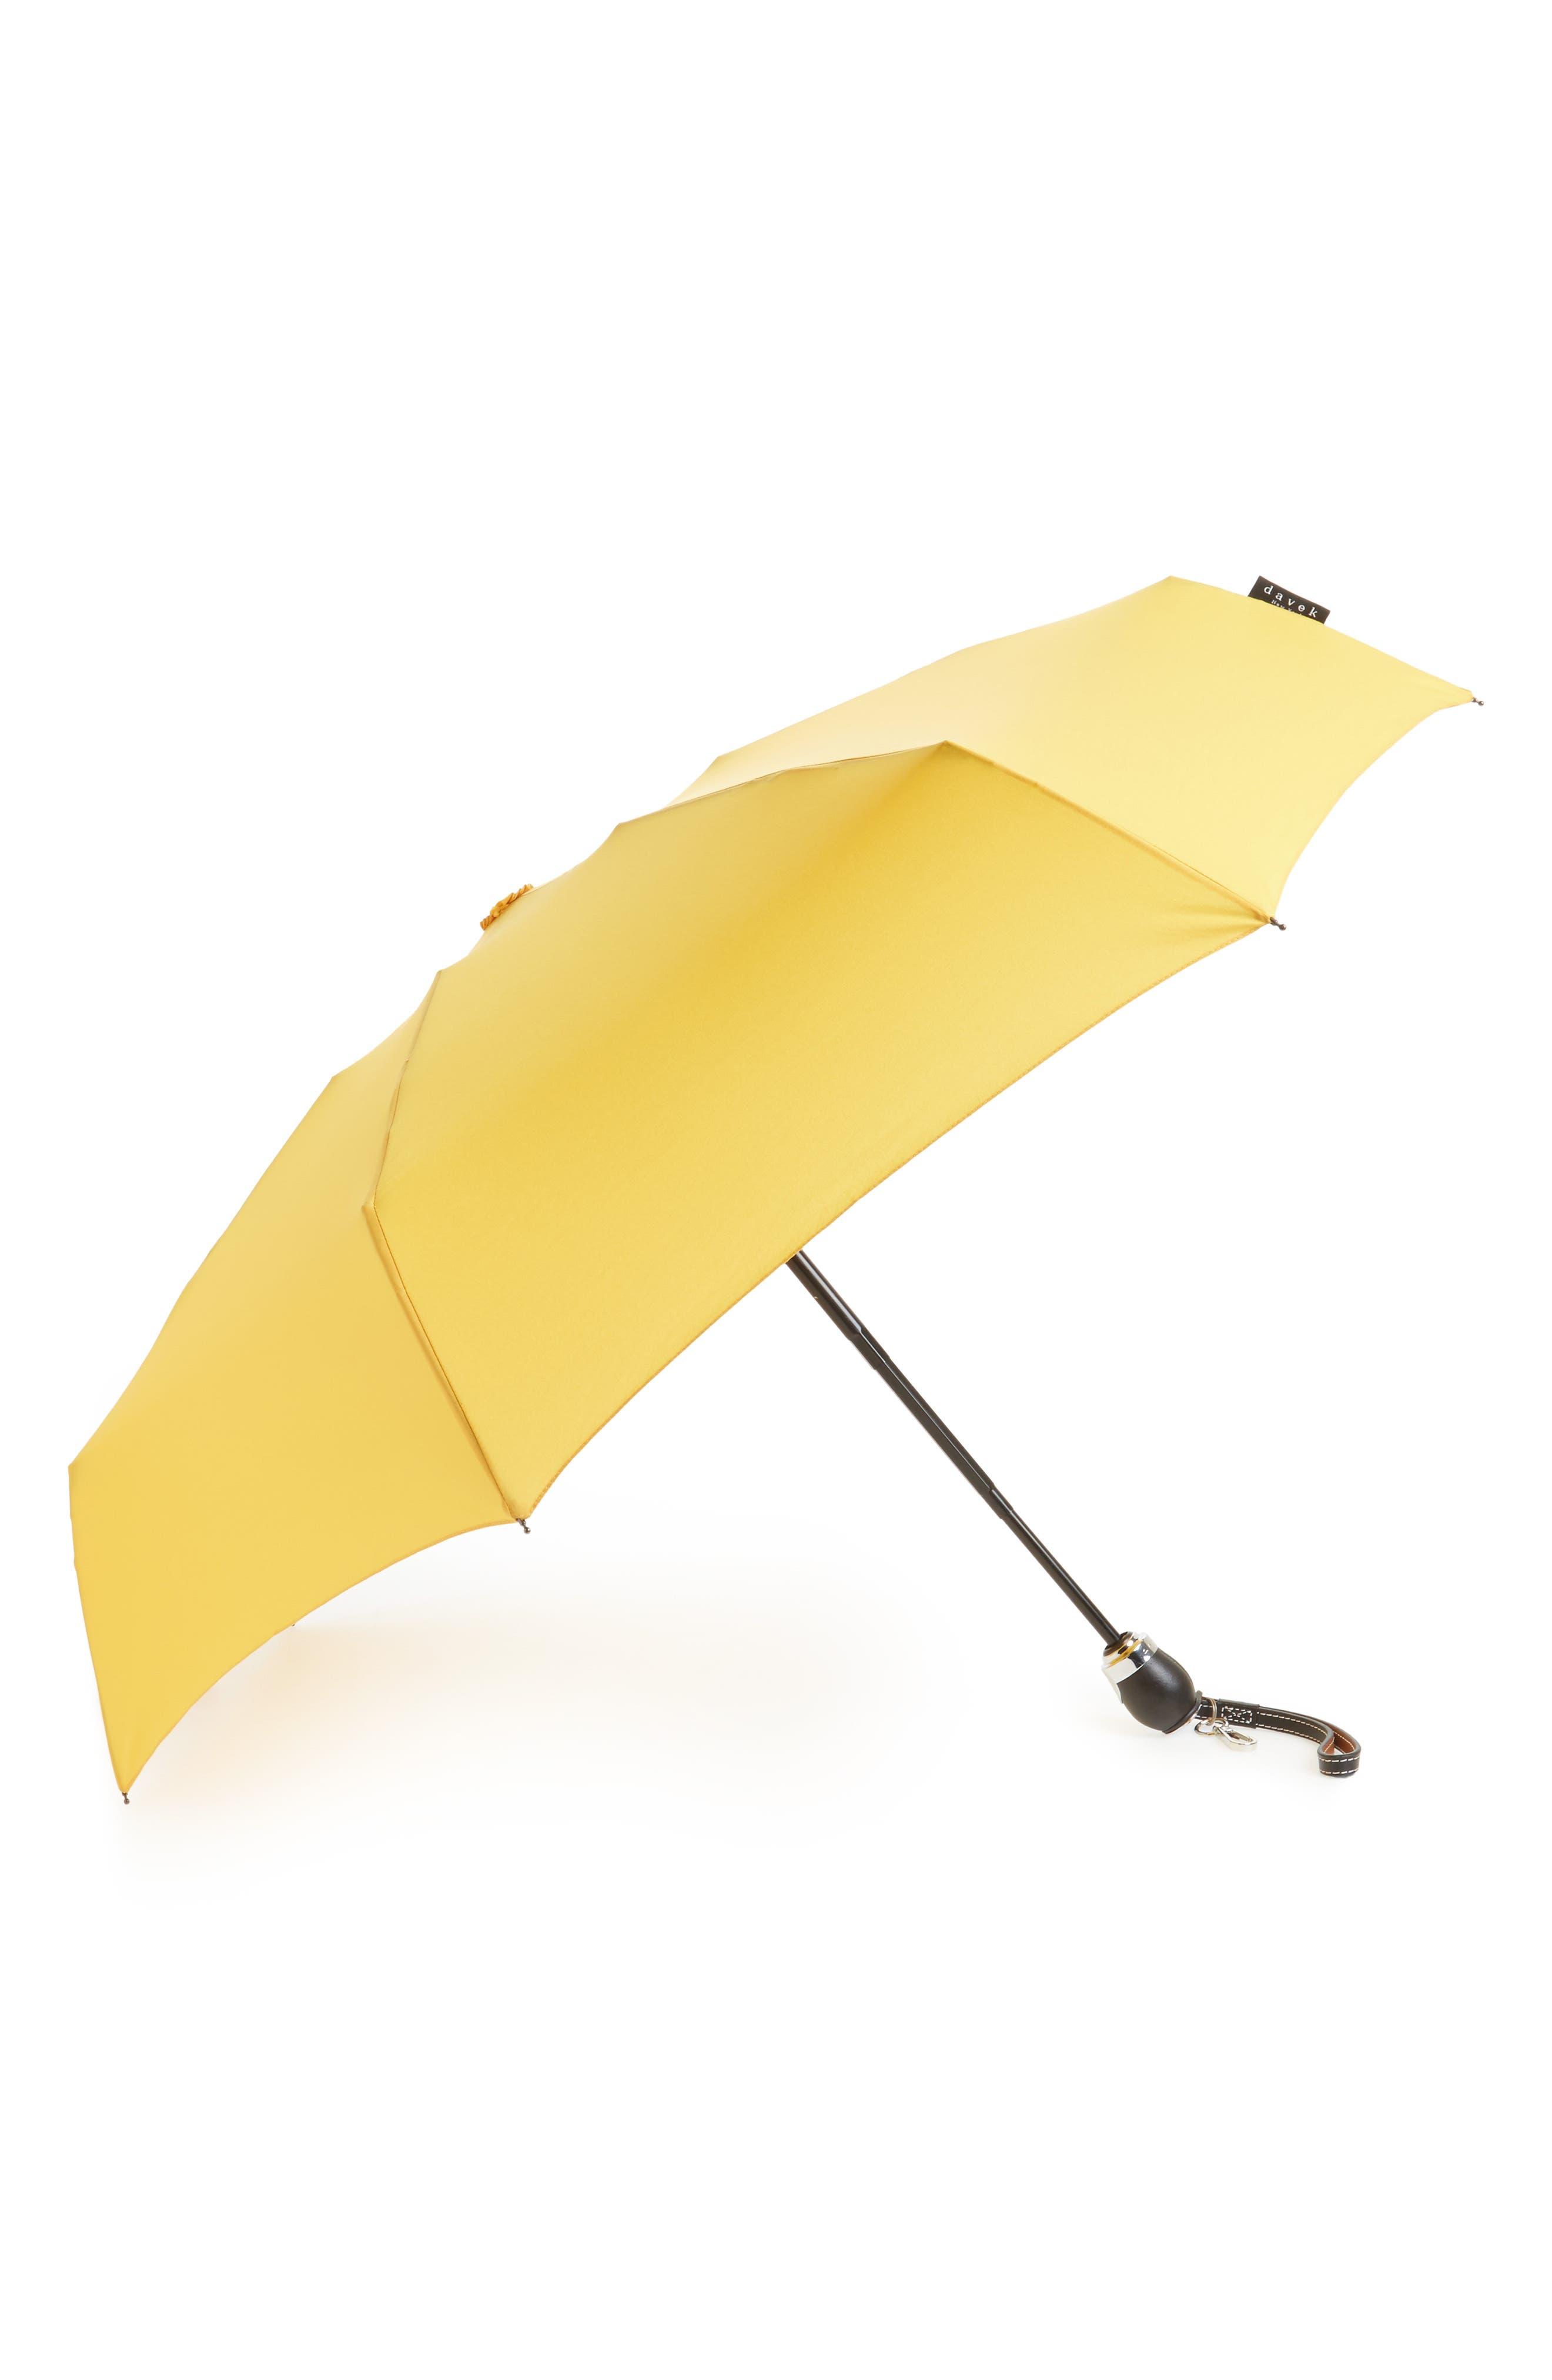 Main Image - DAVEK Traveler Umbrella